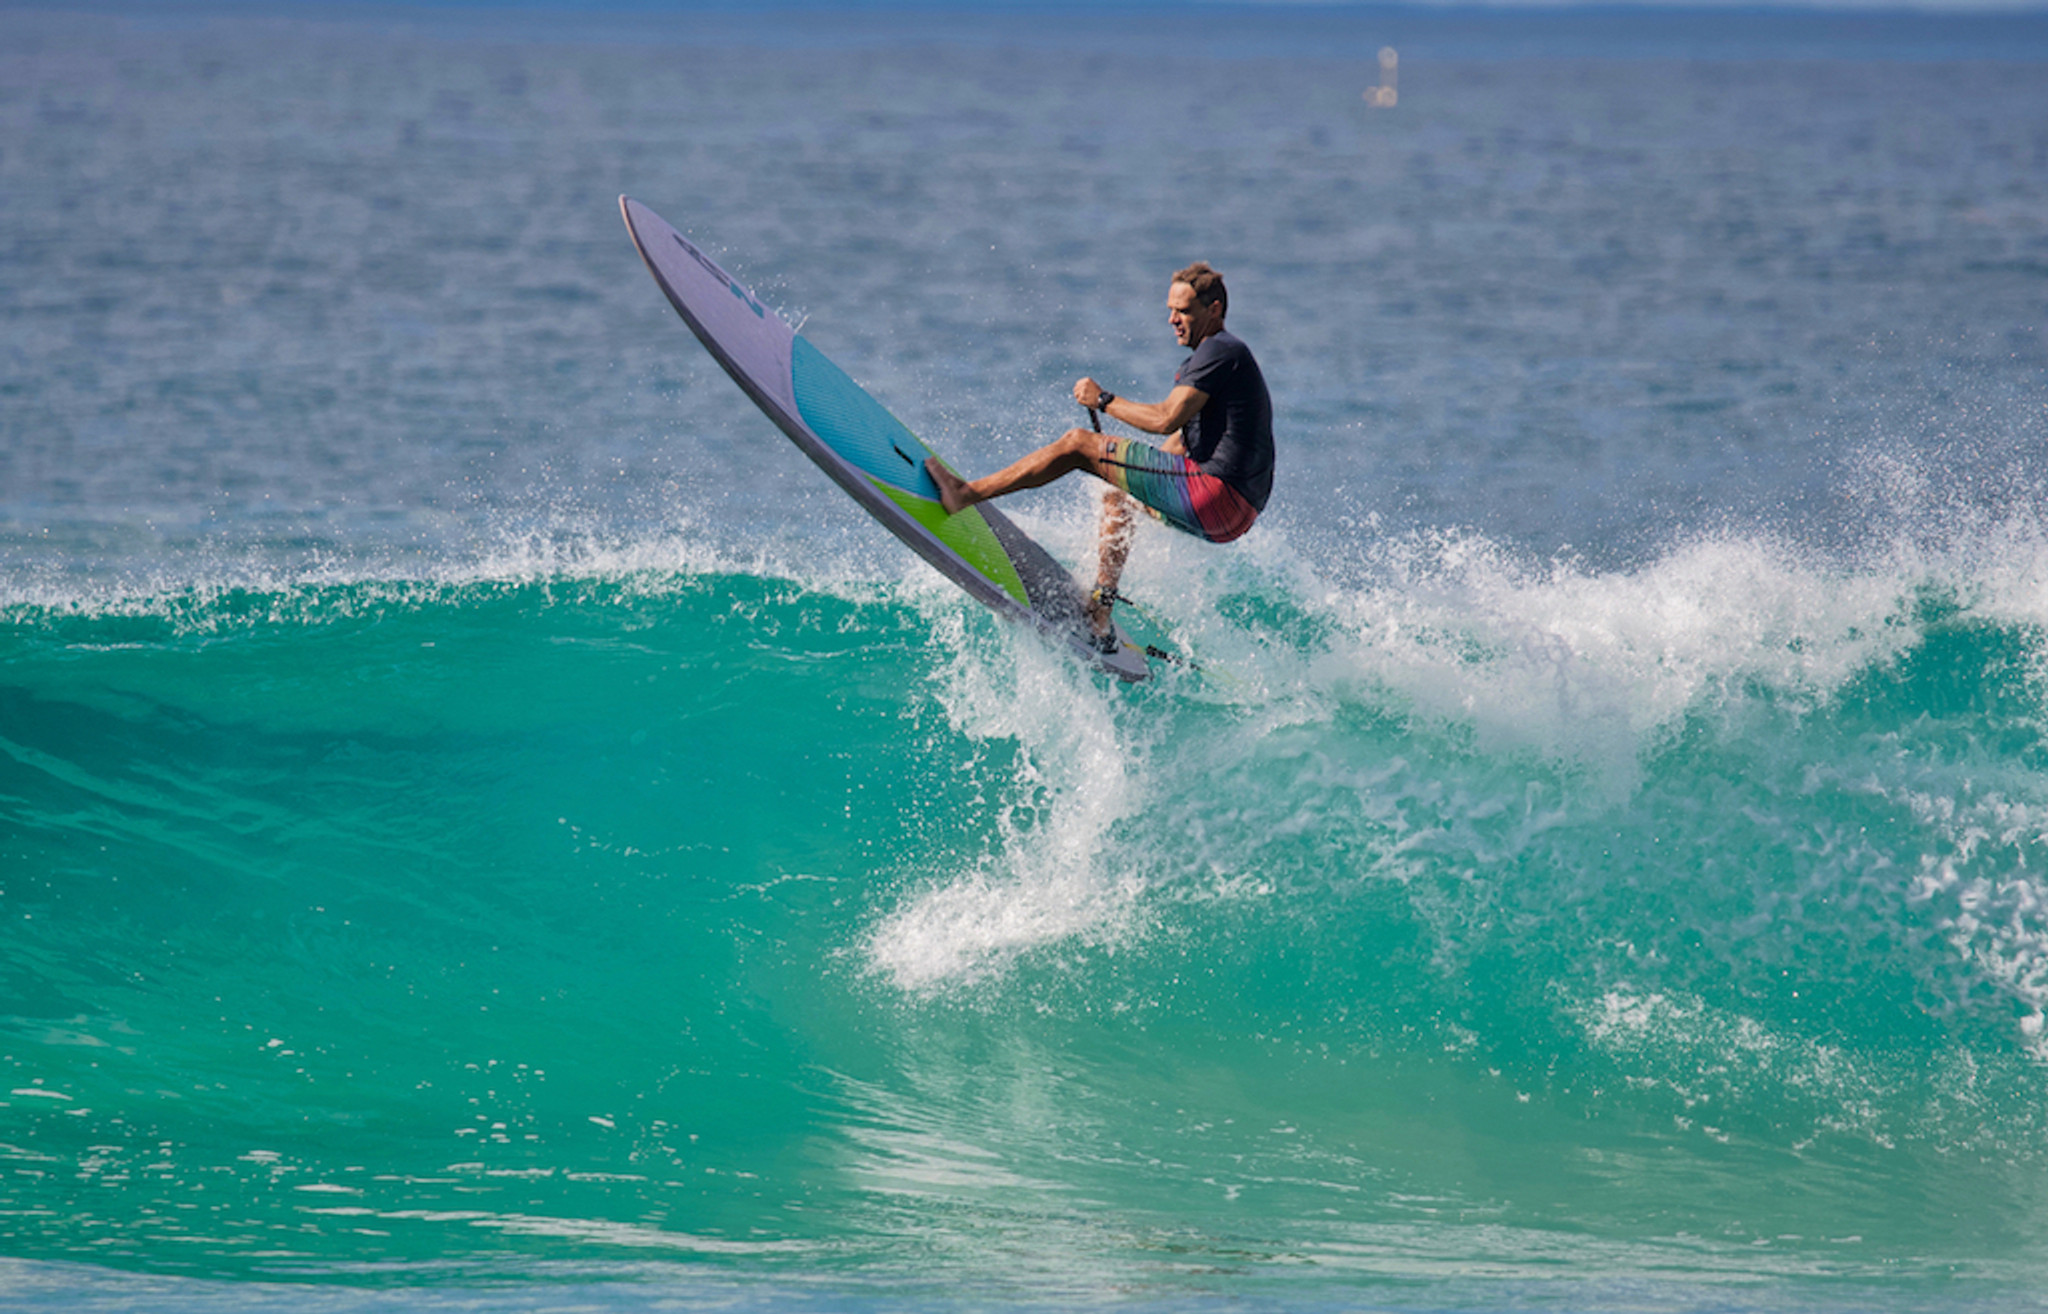 Man shredding waves on a surf SUP board